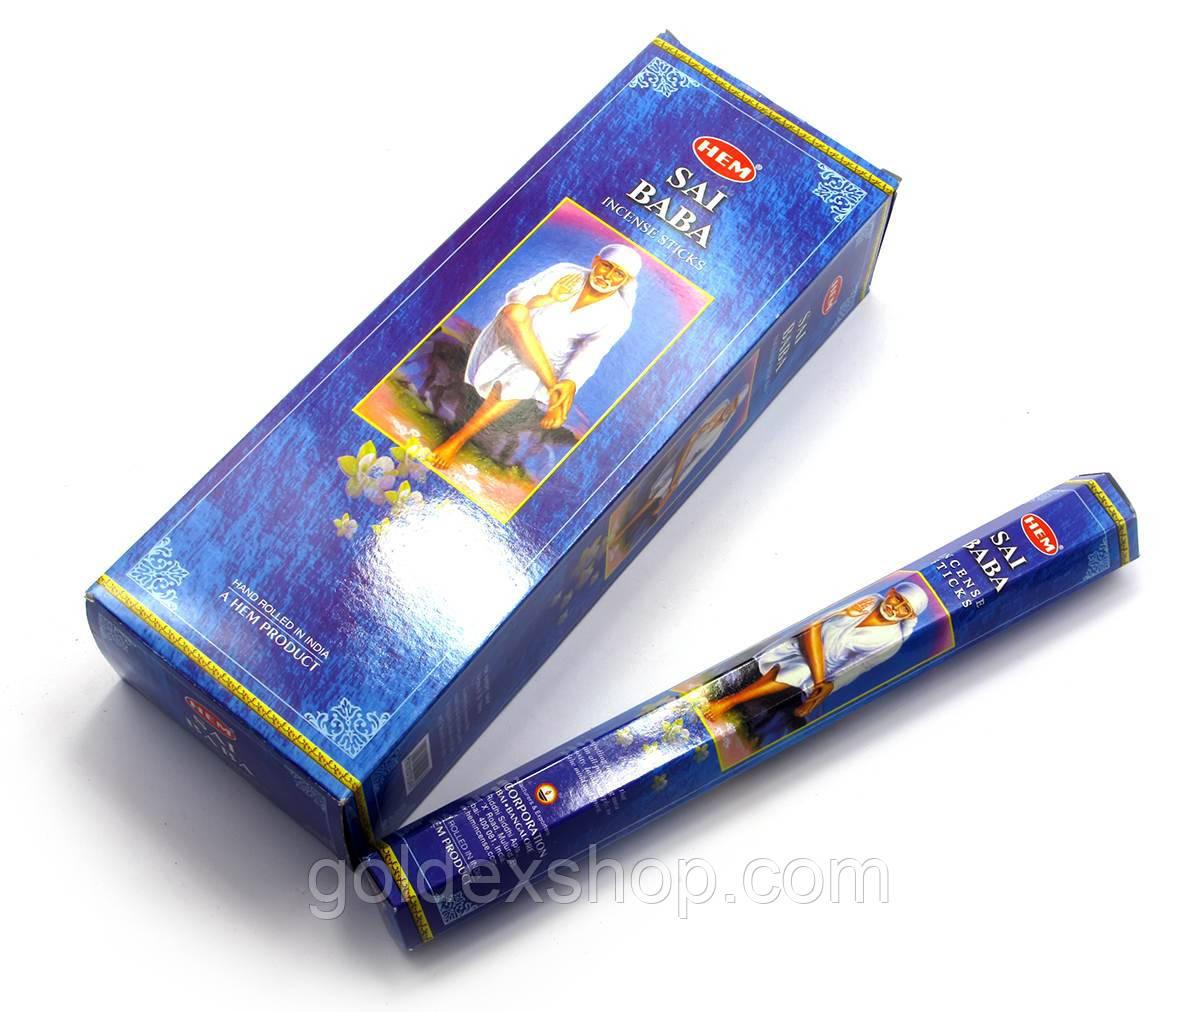 Sai Baba (Сай Баба) (Hem) шестигранник, аромапалочки